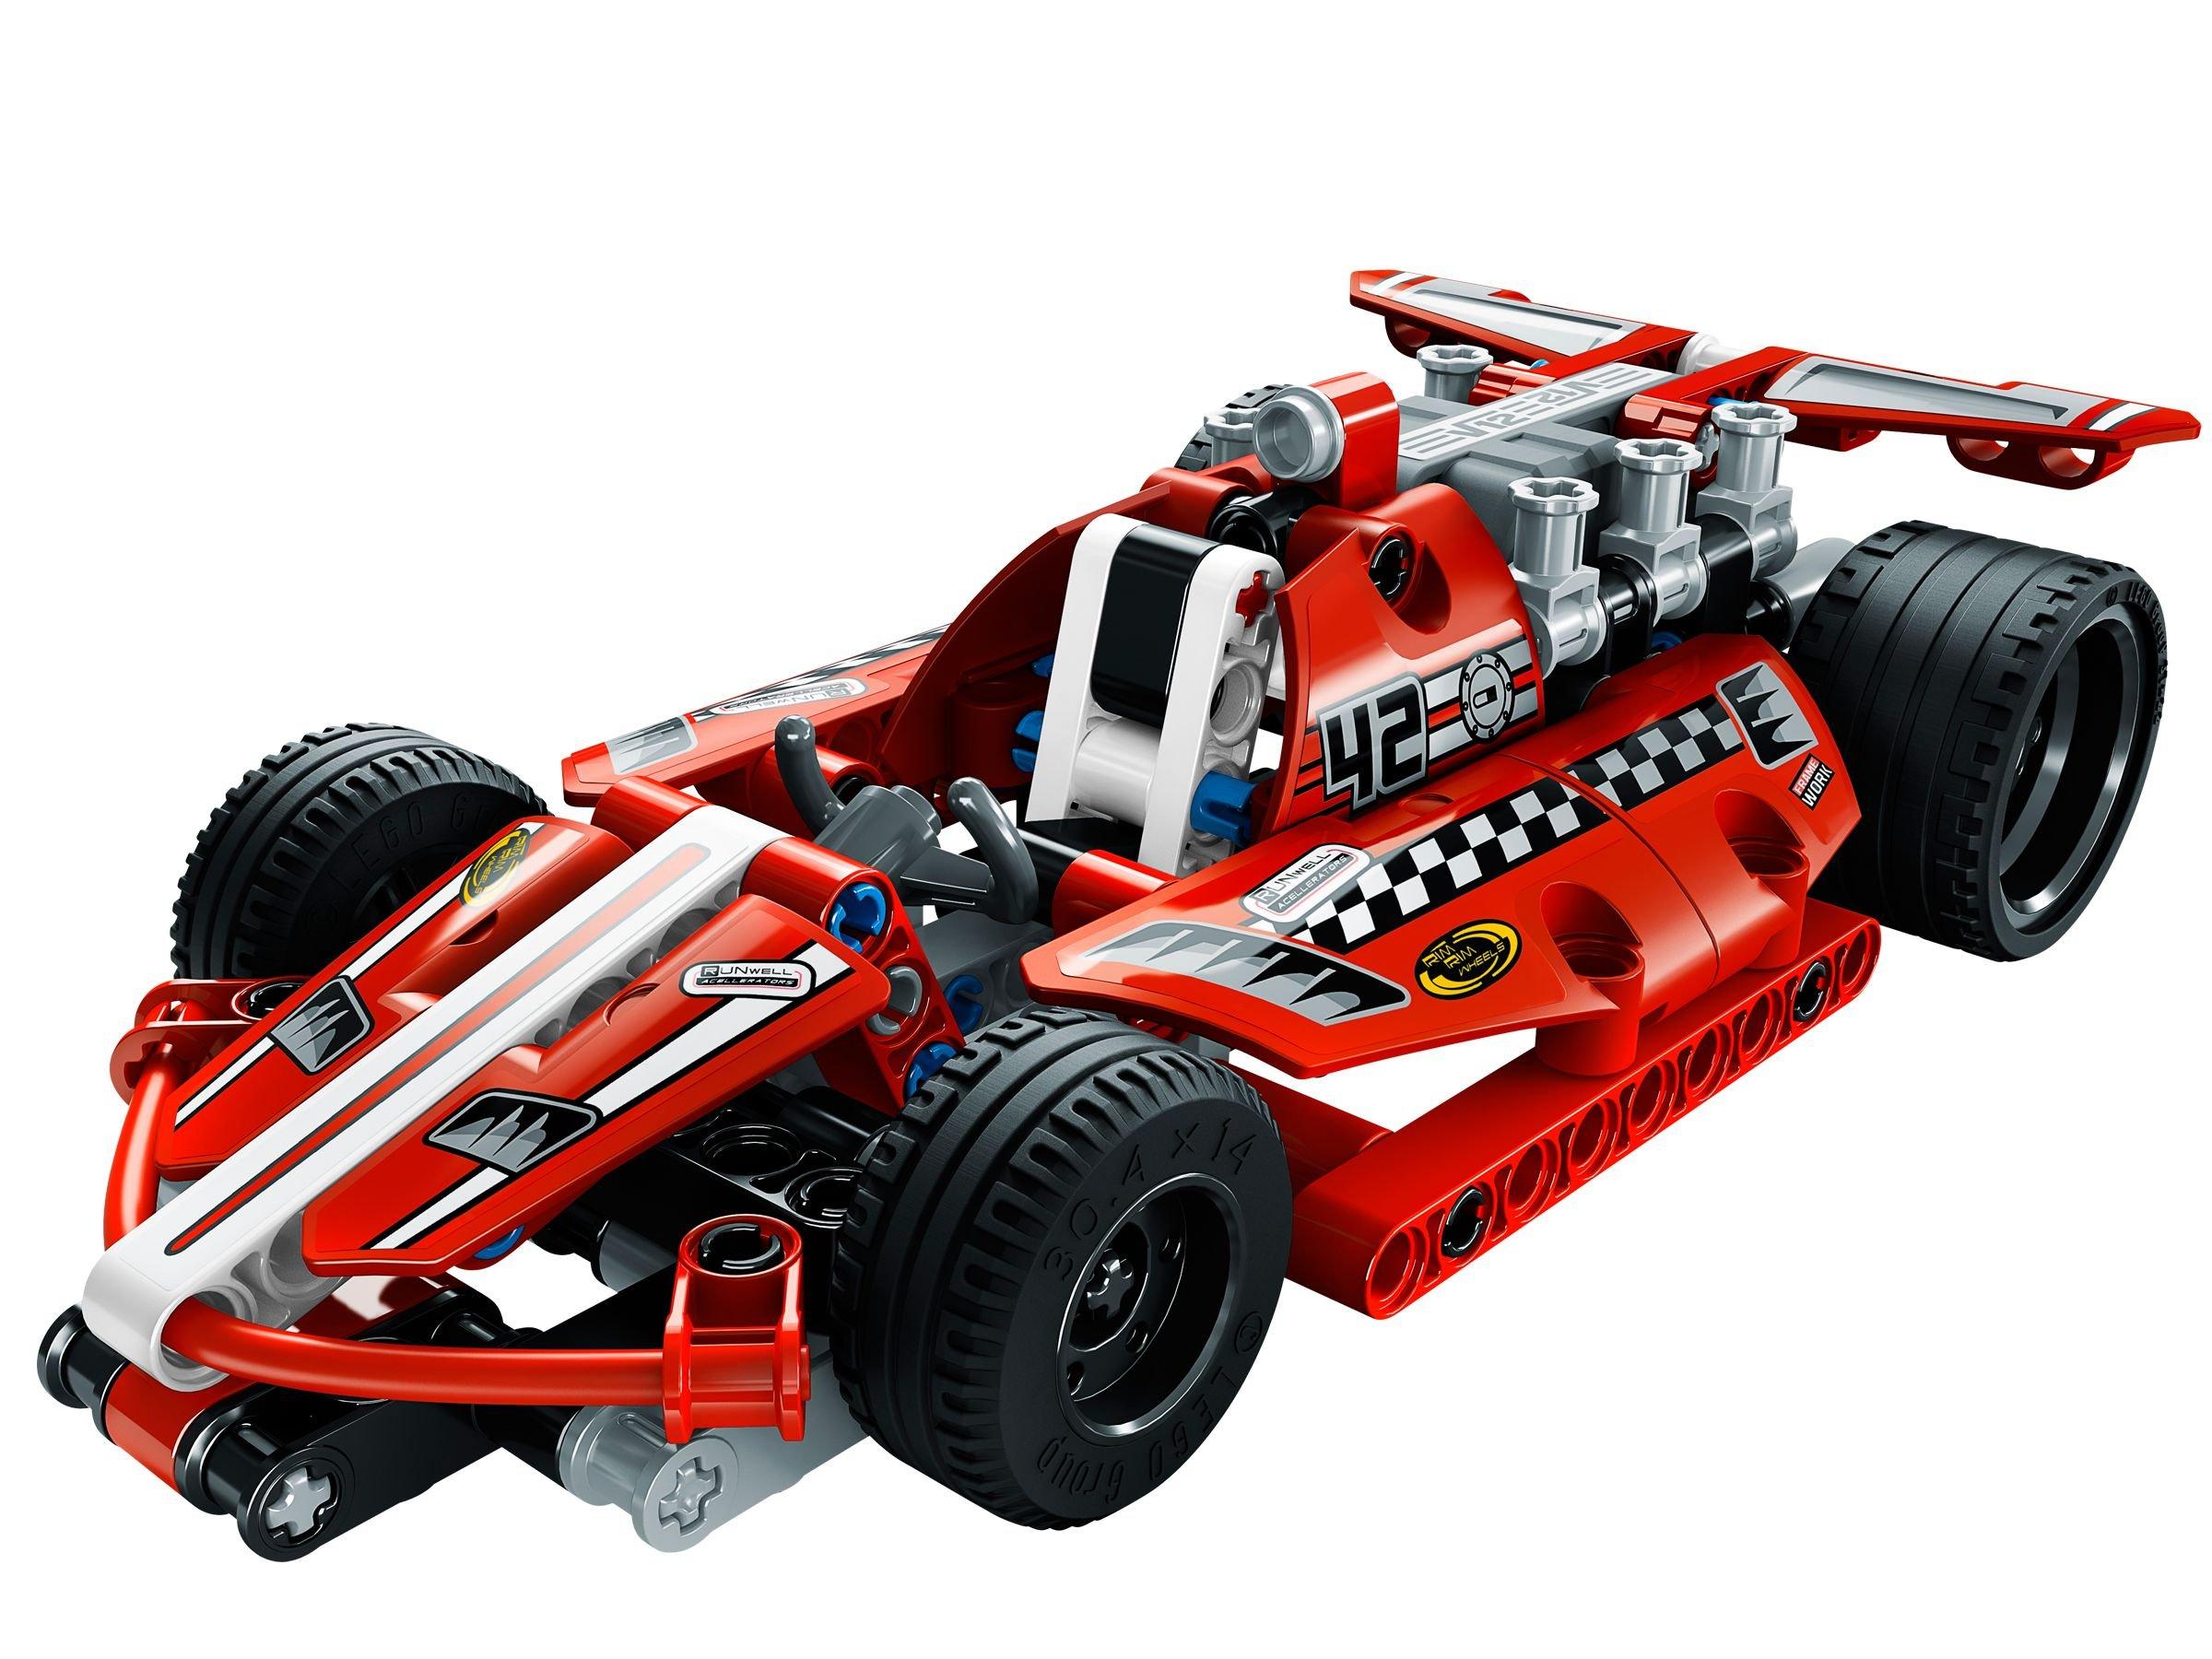 lego 42011 action rennwagen technic 2013 race car. Black Bedroom Furniture Sets. Home Design Ideas